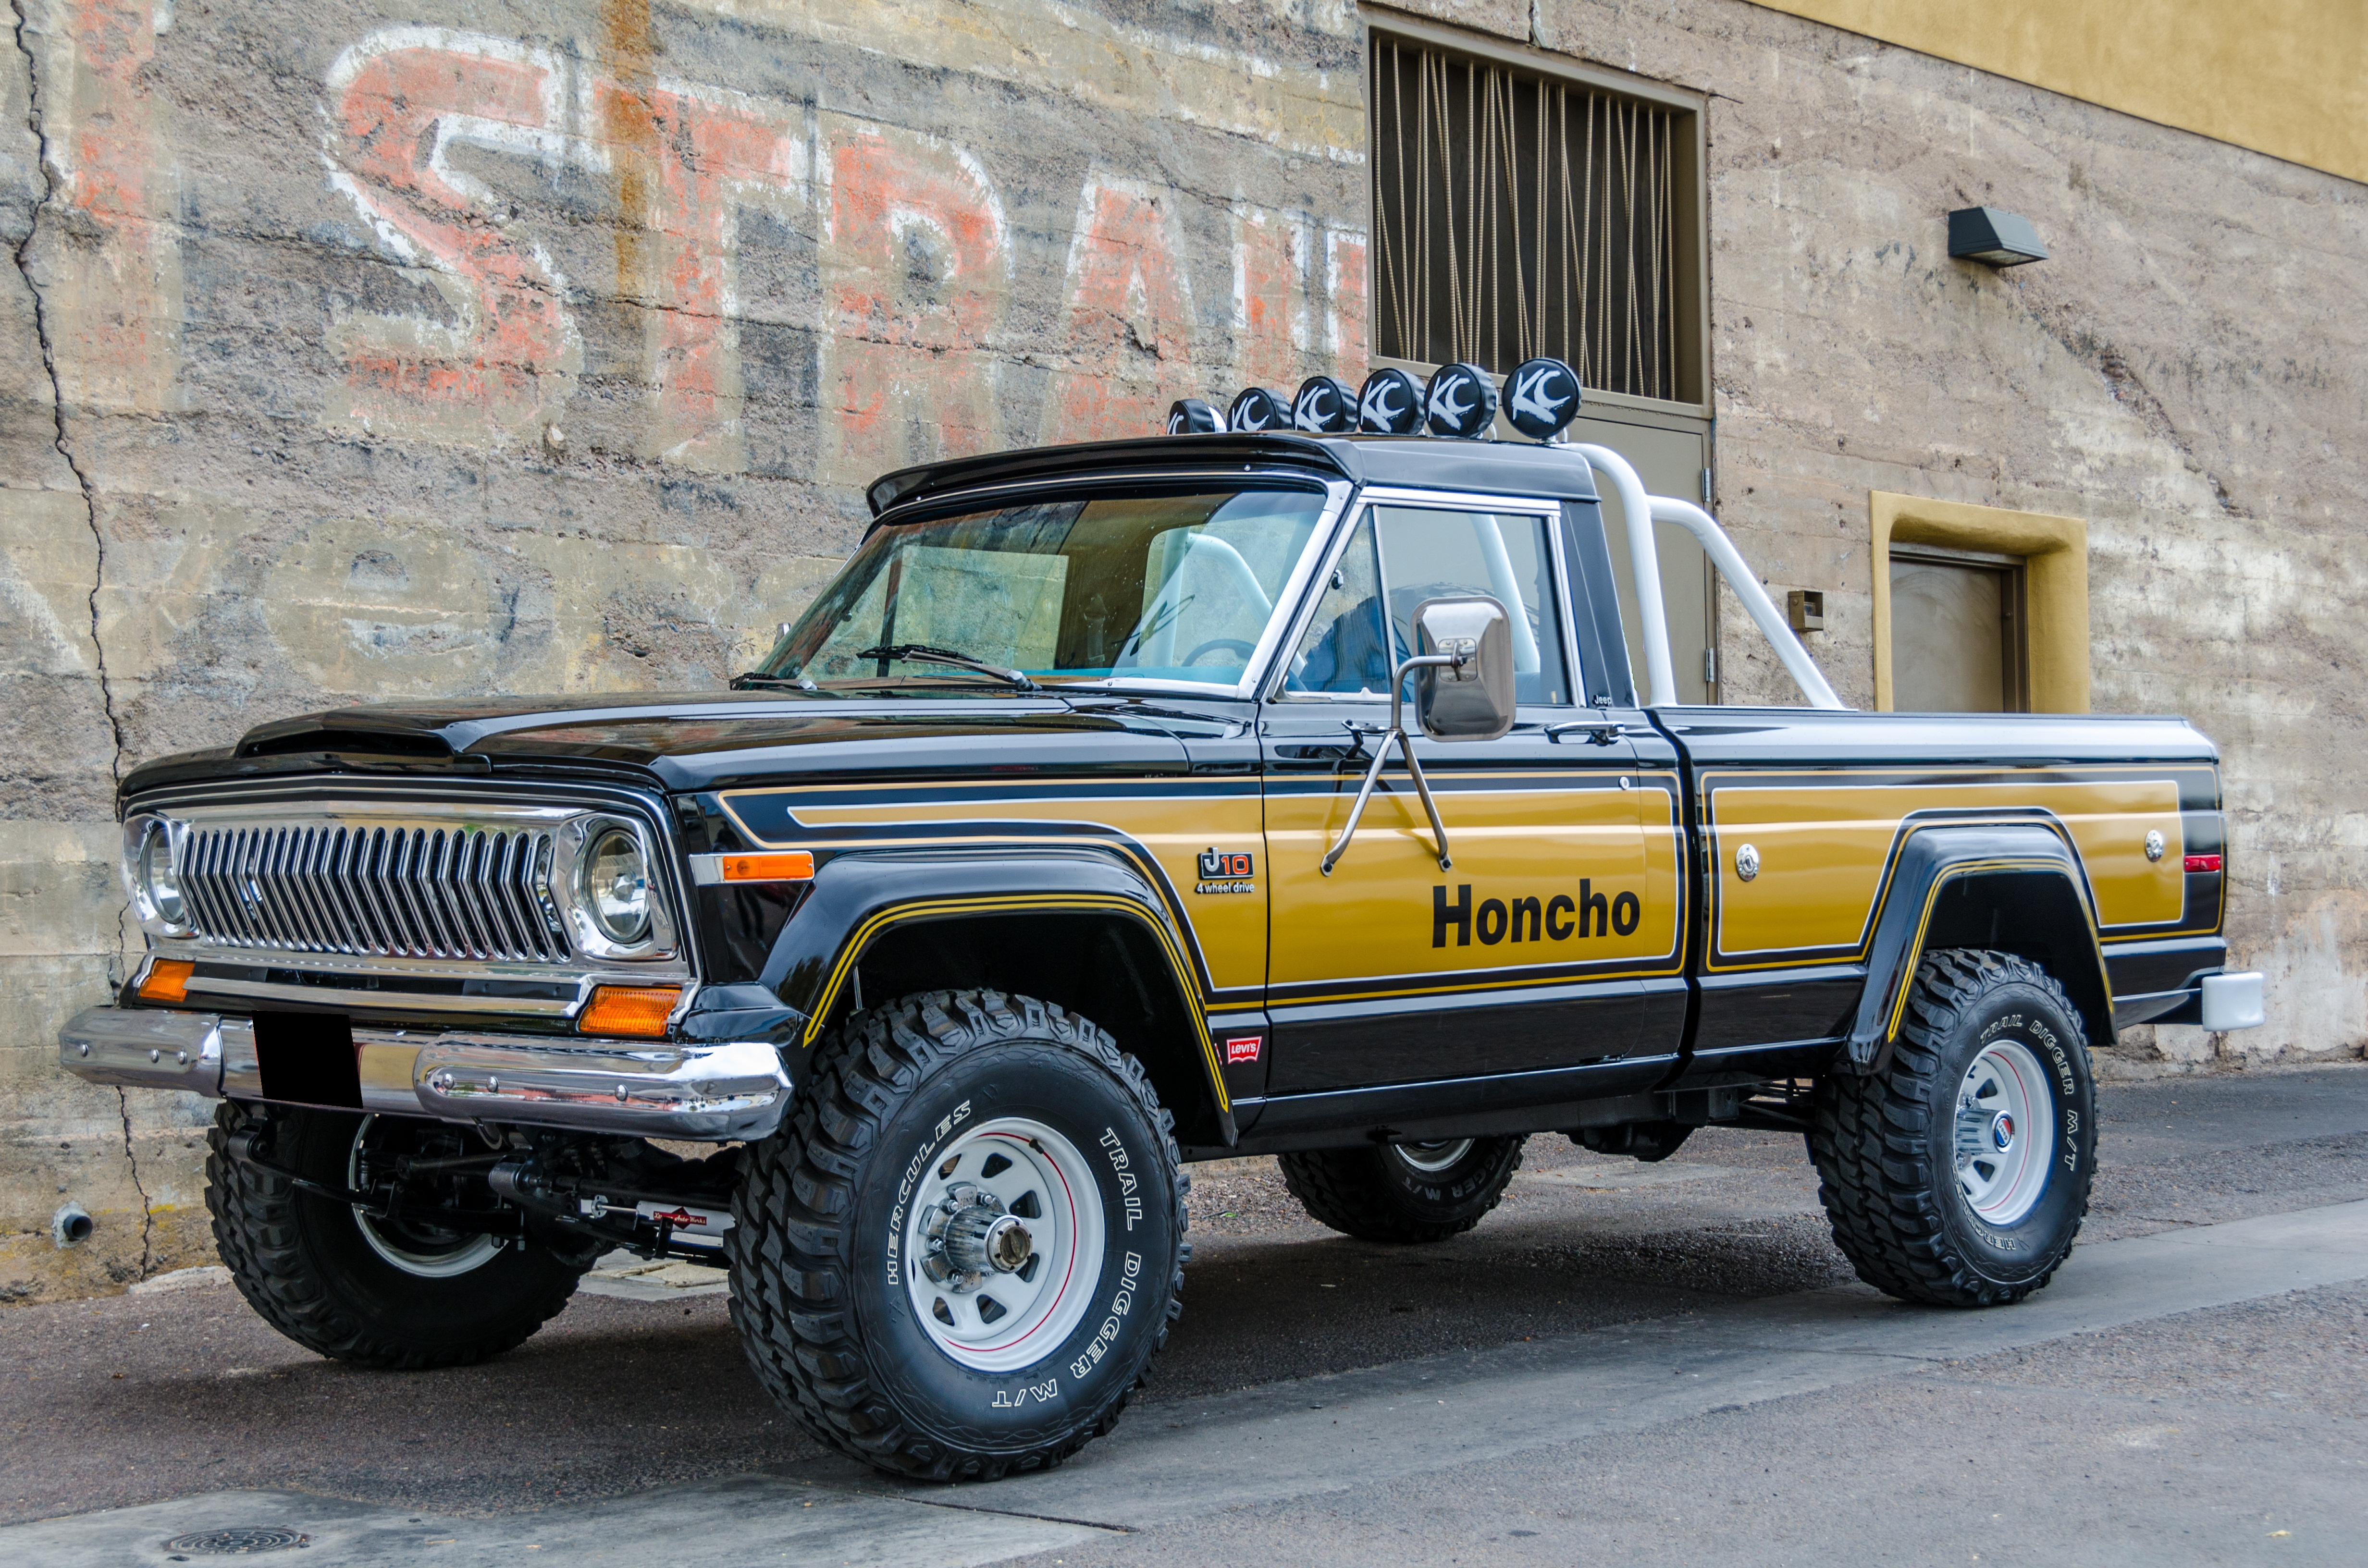 1977 american j10 jeep honcho / levi